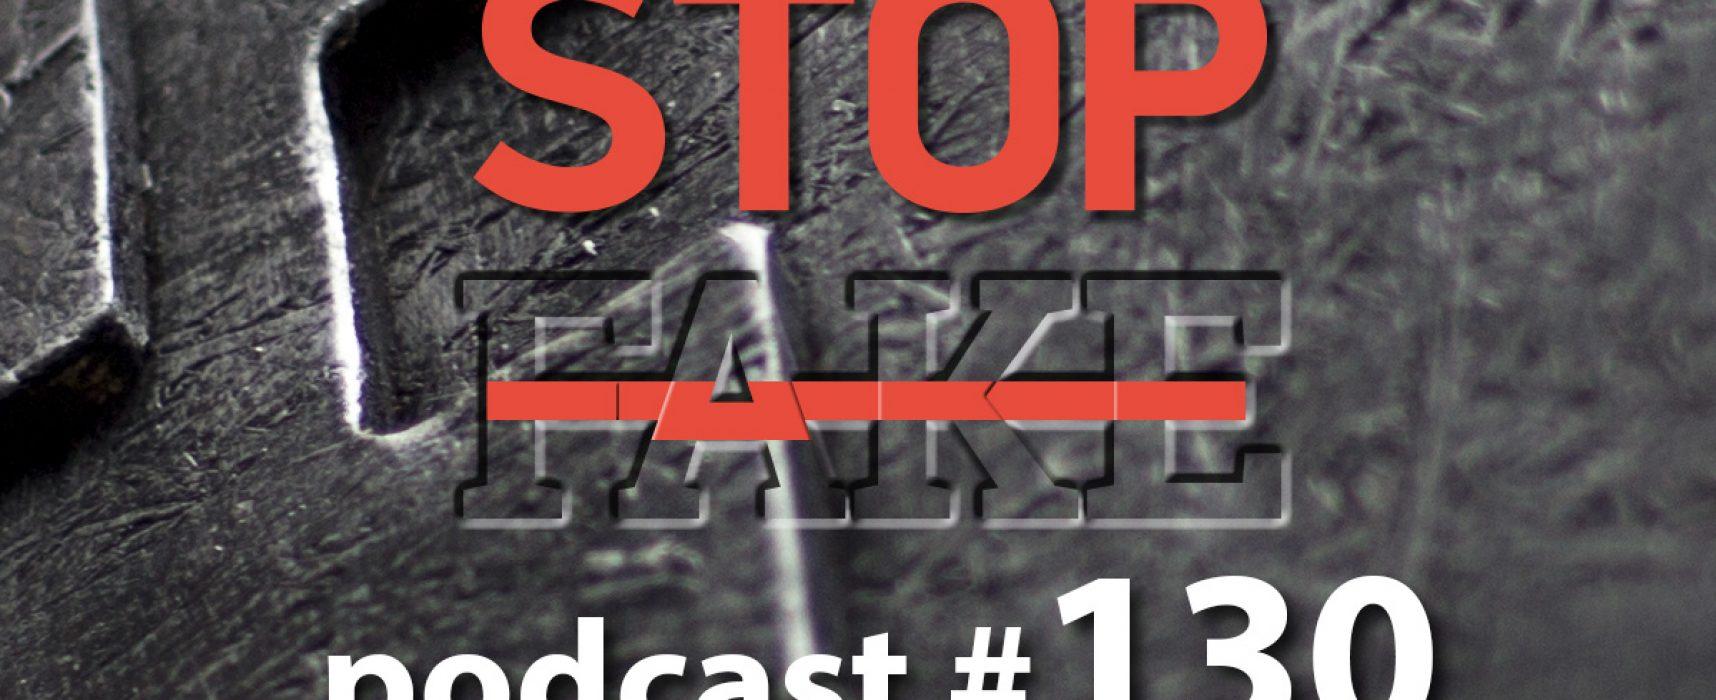 StopFake podcast #130